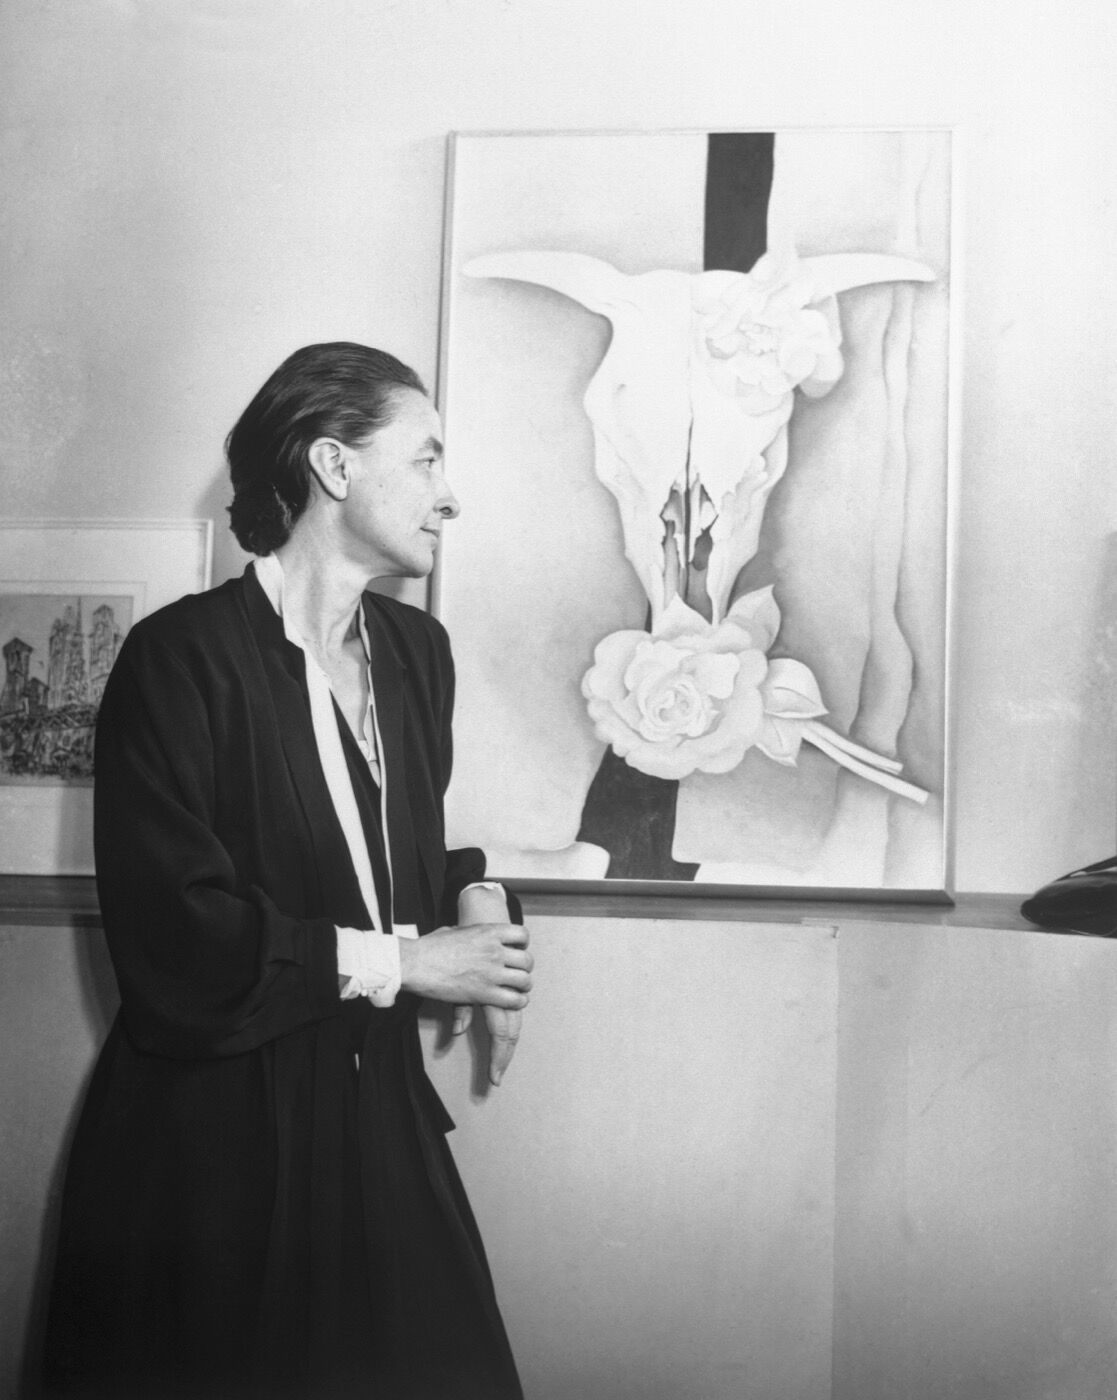 Portrait of Georgia O'Keeffe by Bettmann via Getty Images.